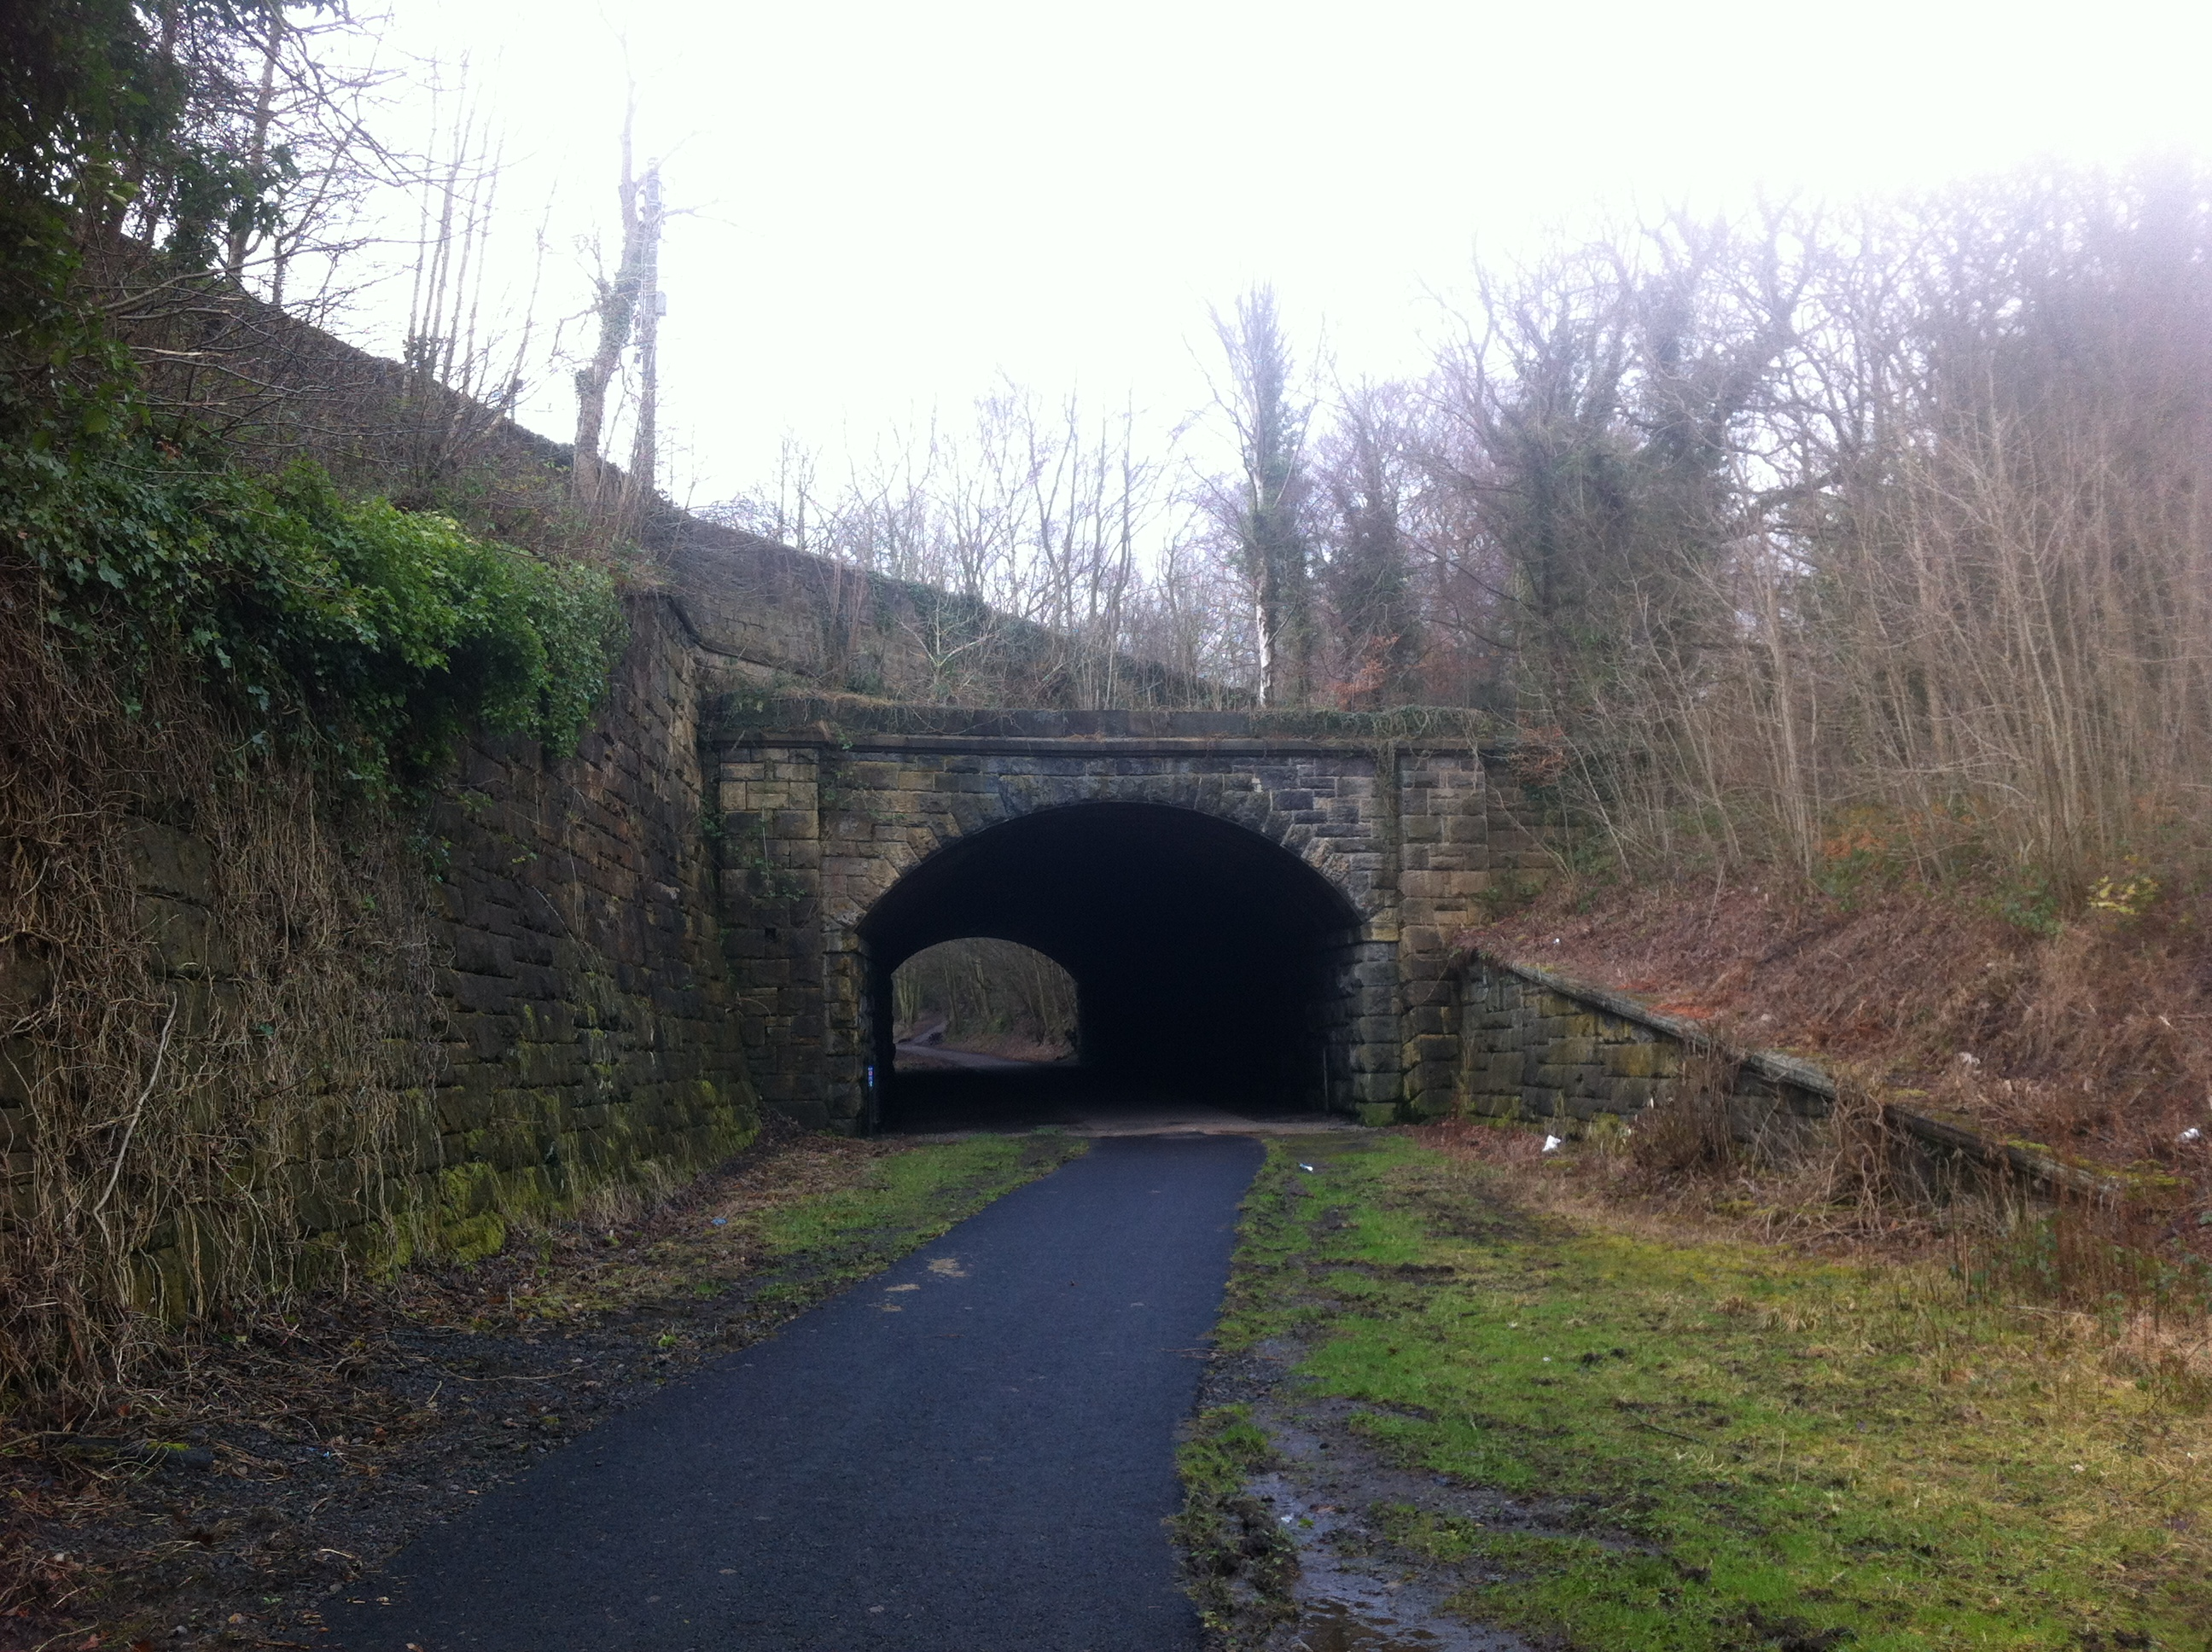 Tunnel at Beamish Station 1